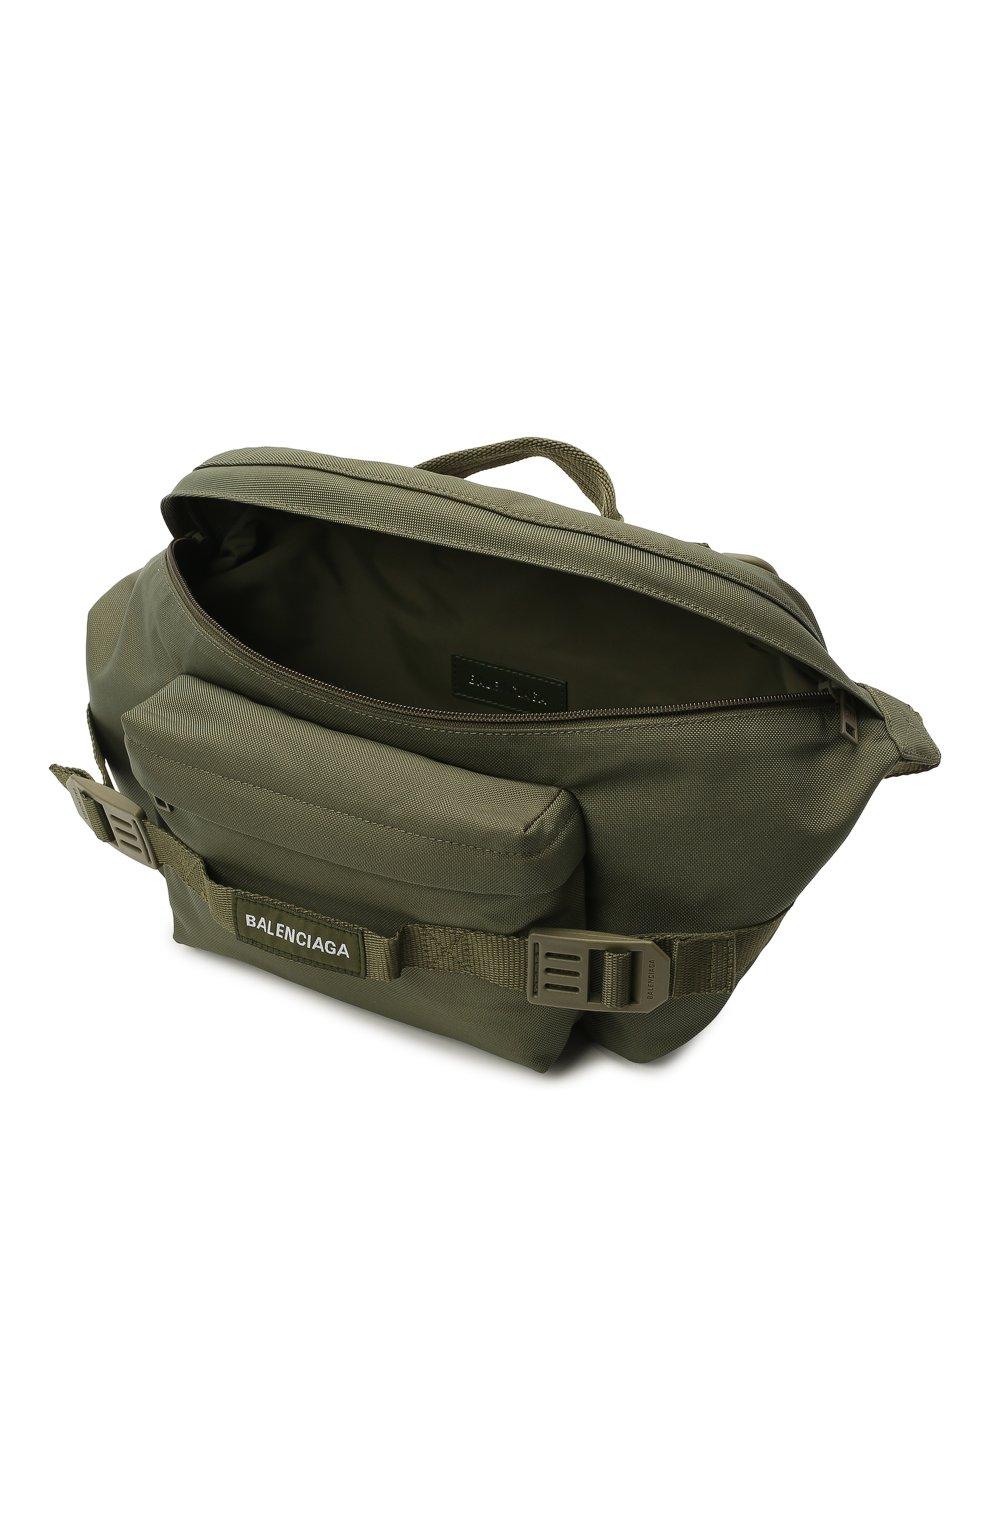 Мужская текстильная поясная сумка army BALENCIAGA хаки цвета, арт. 644035/2BKPI   Фото 4 (Ремень/цепочка: На ремешке; Материал: Текстиль)